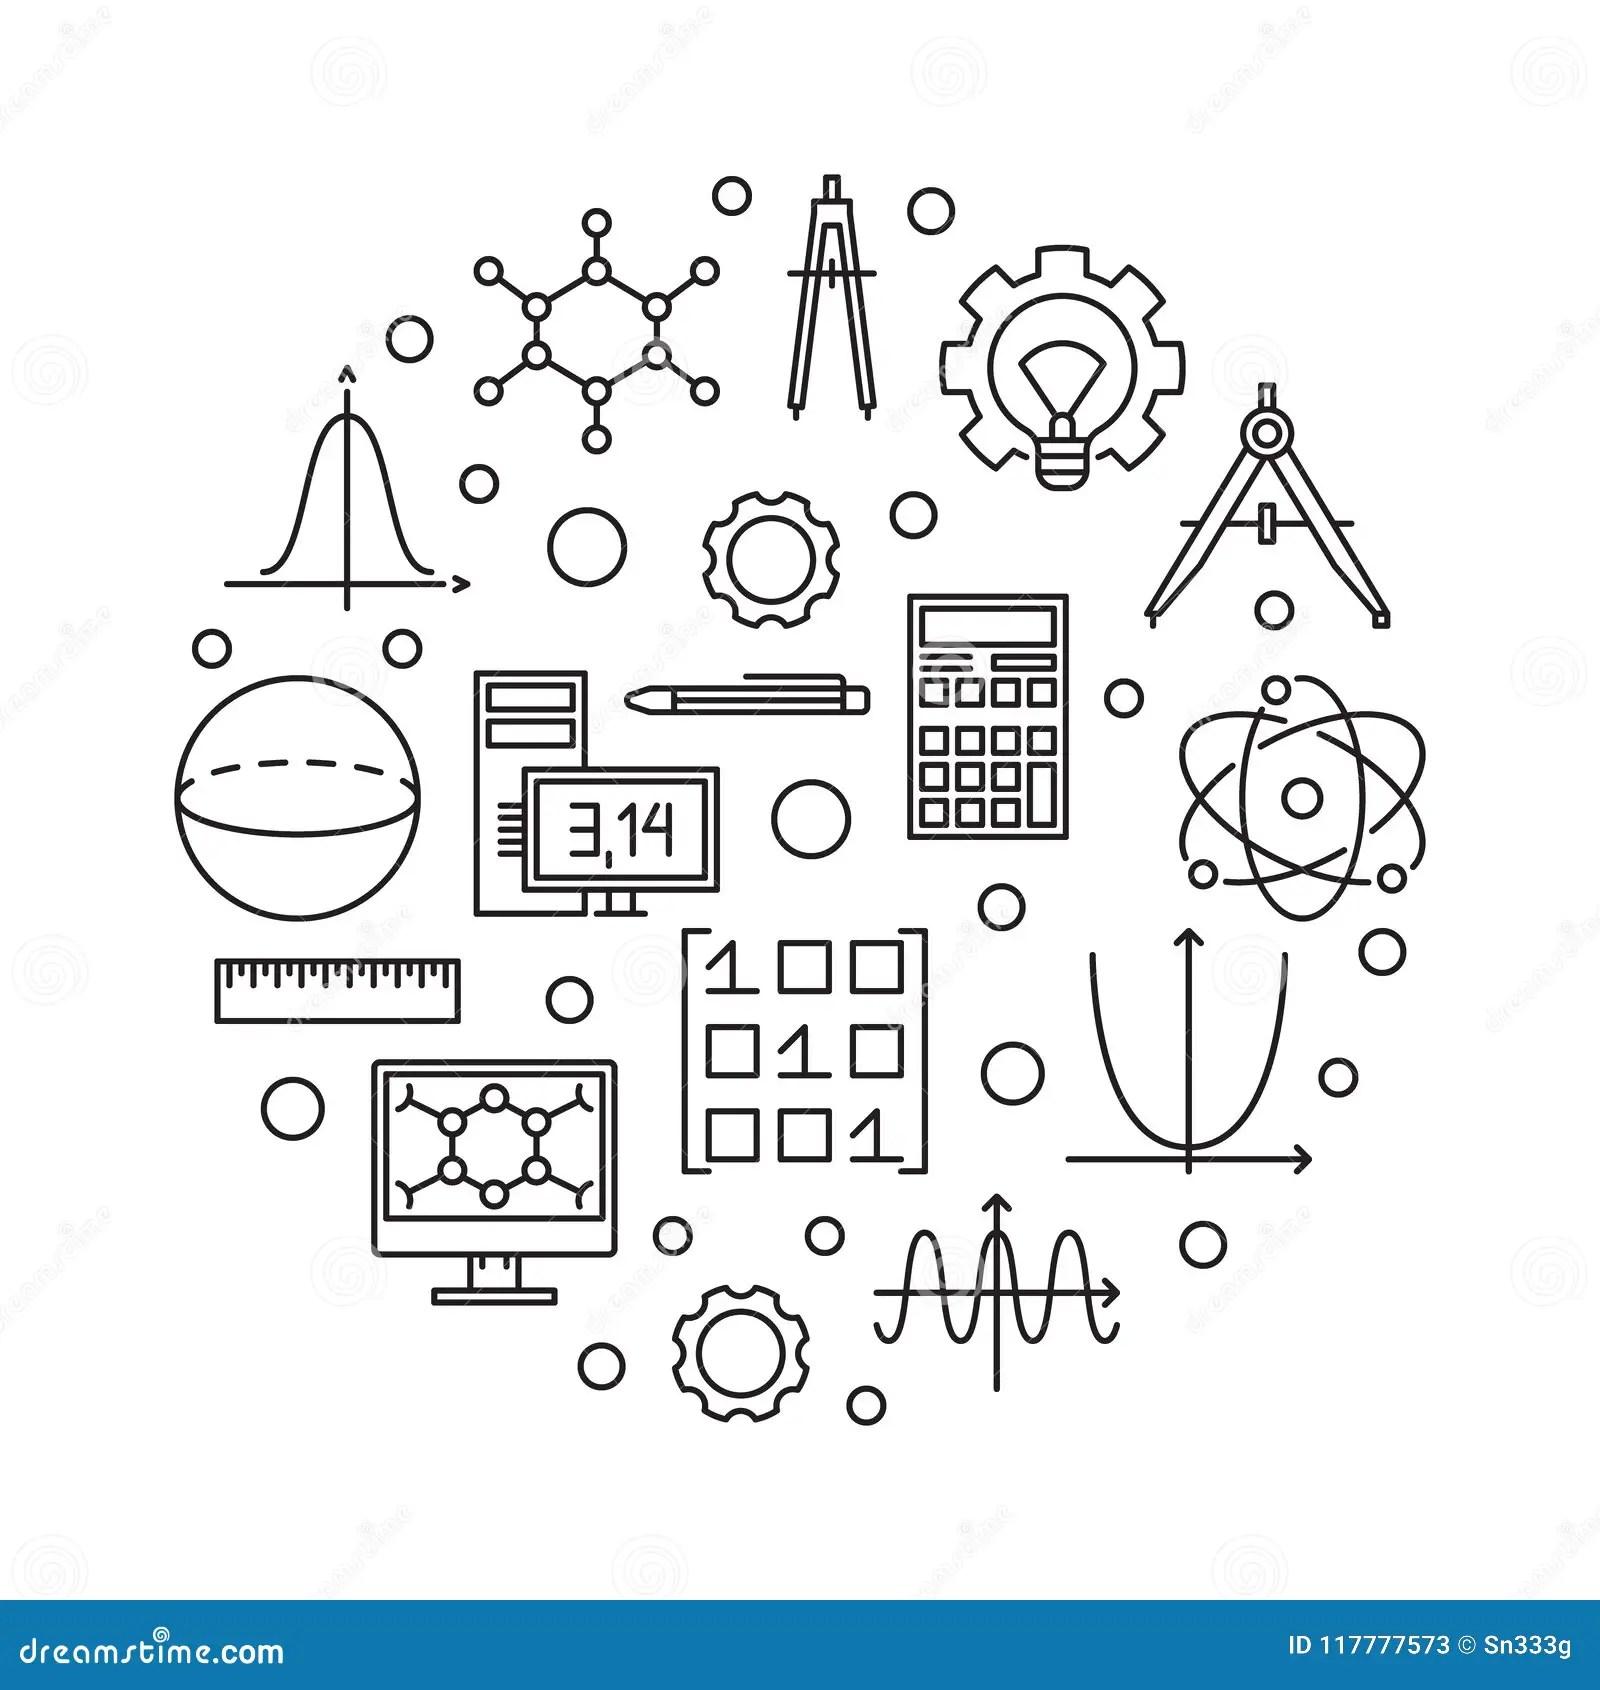 STEM Vector Round Minimal Illustration In Thin Line Style